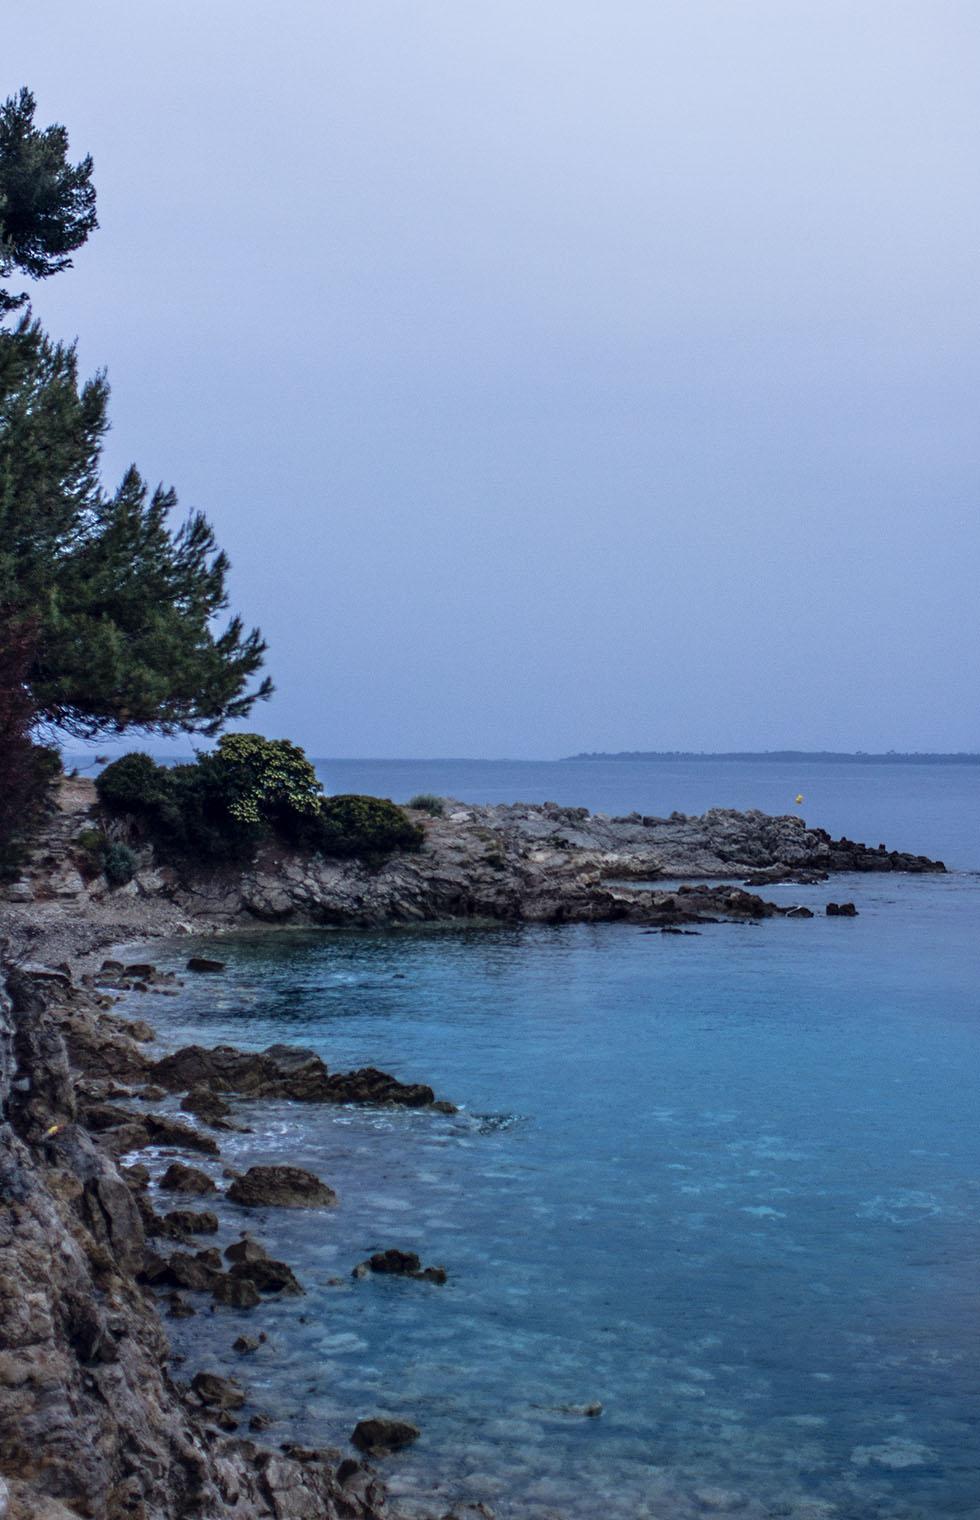 Cap d'Antibes